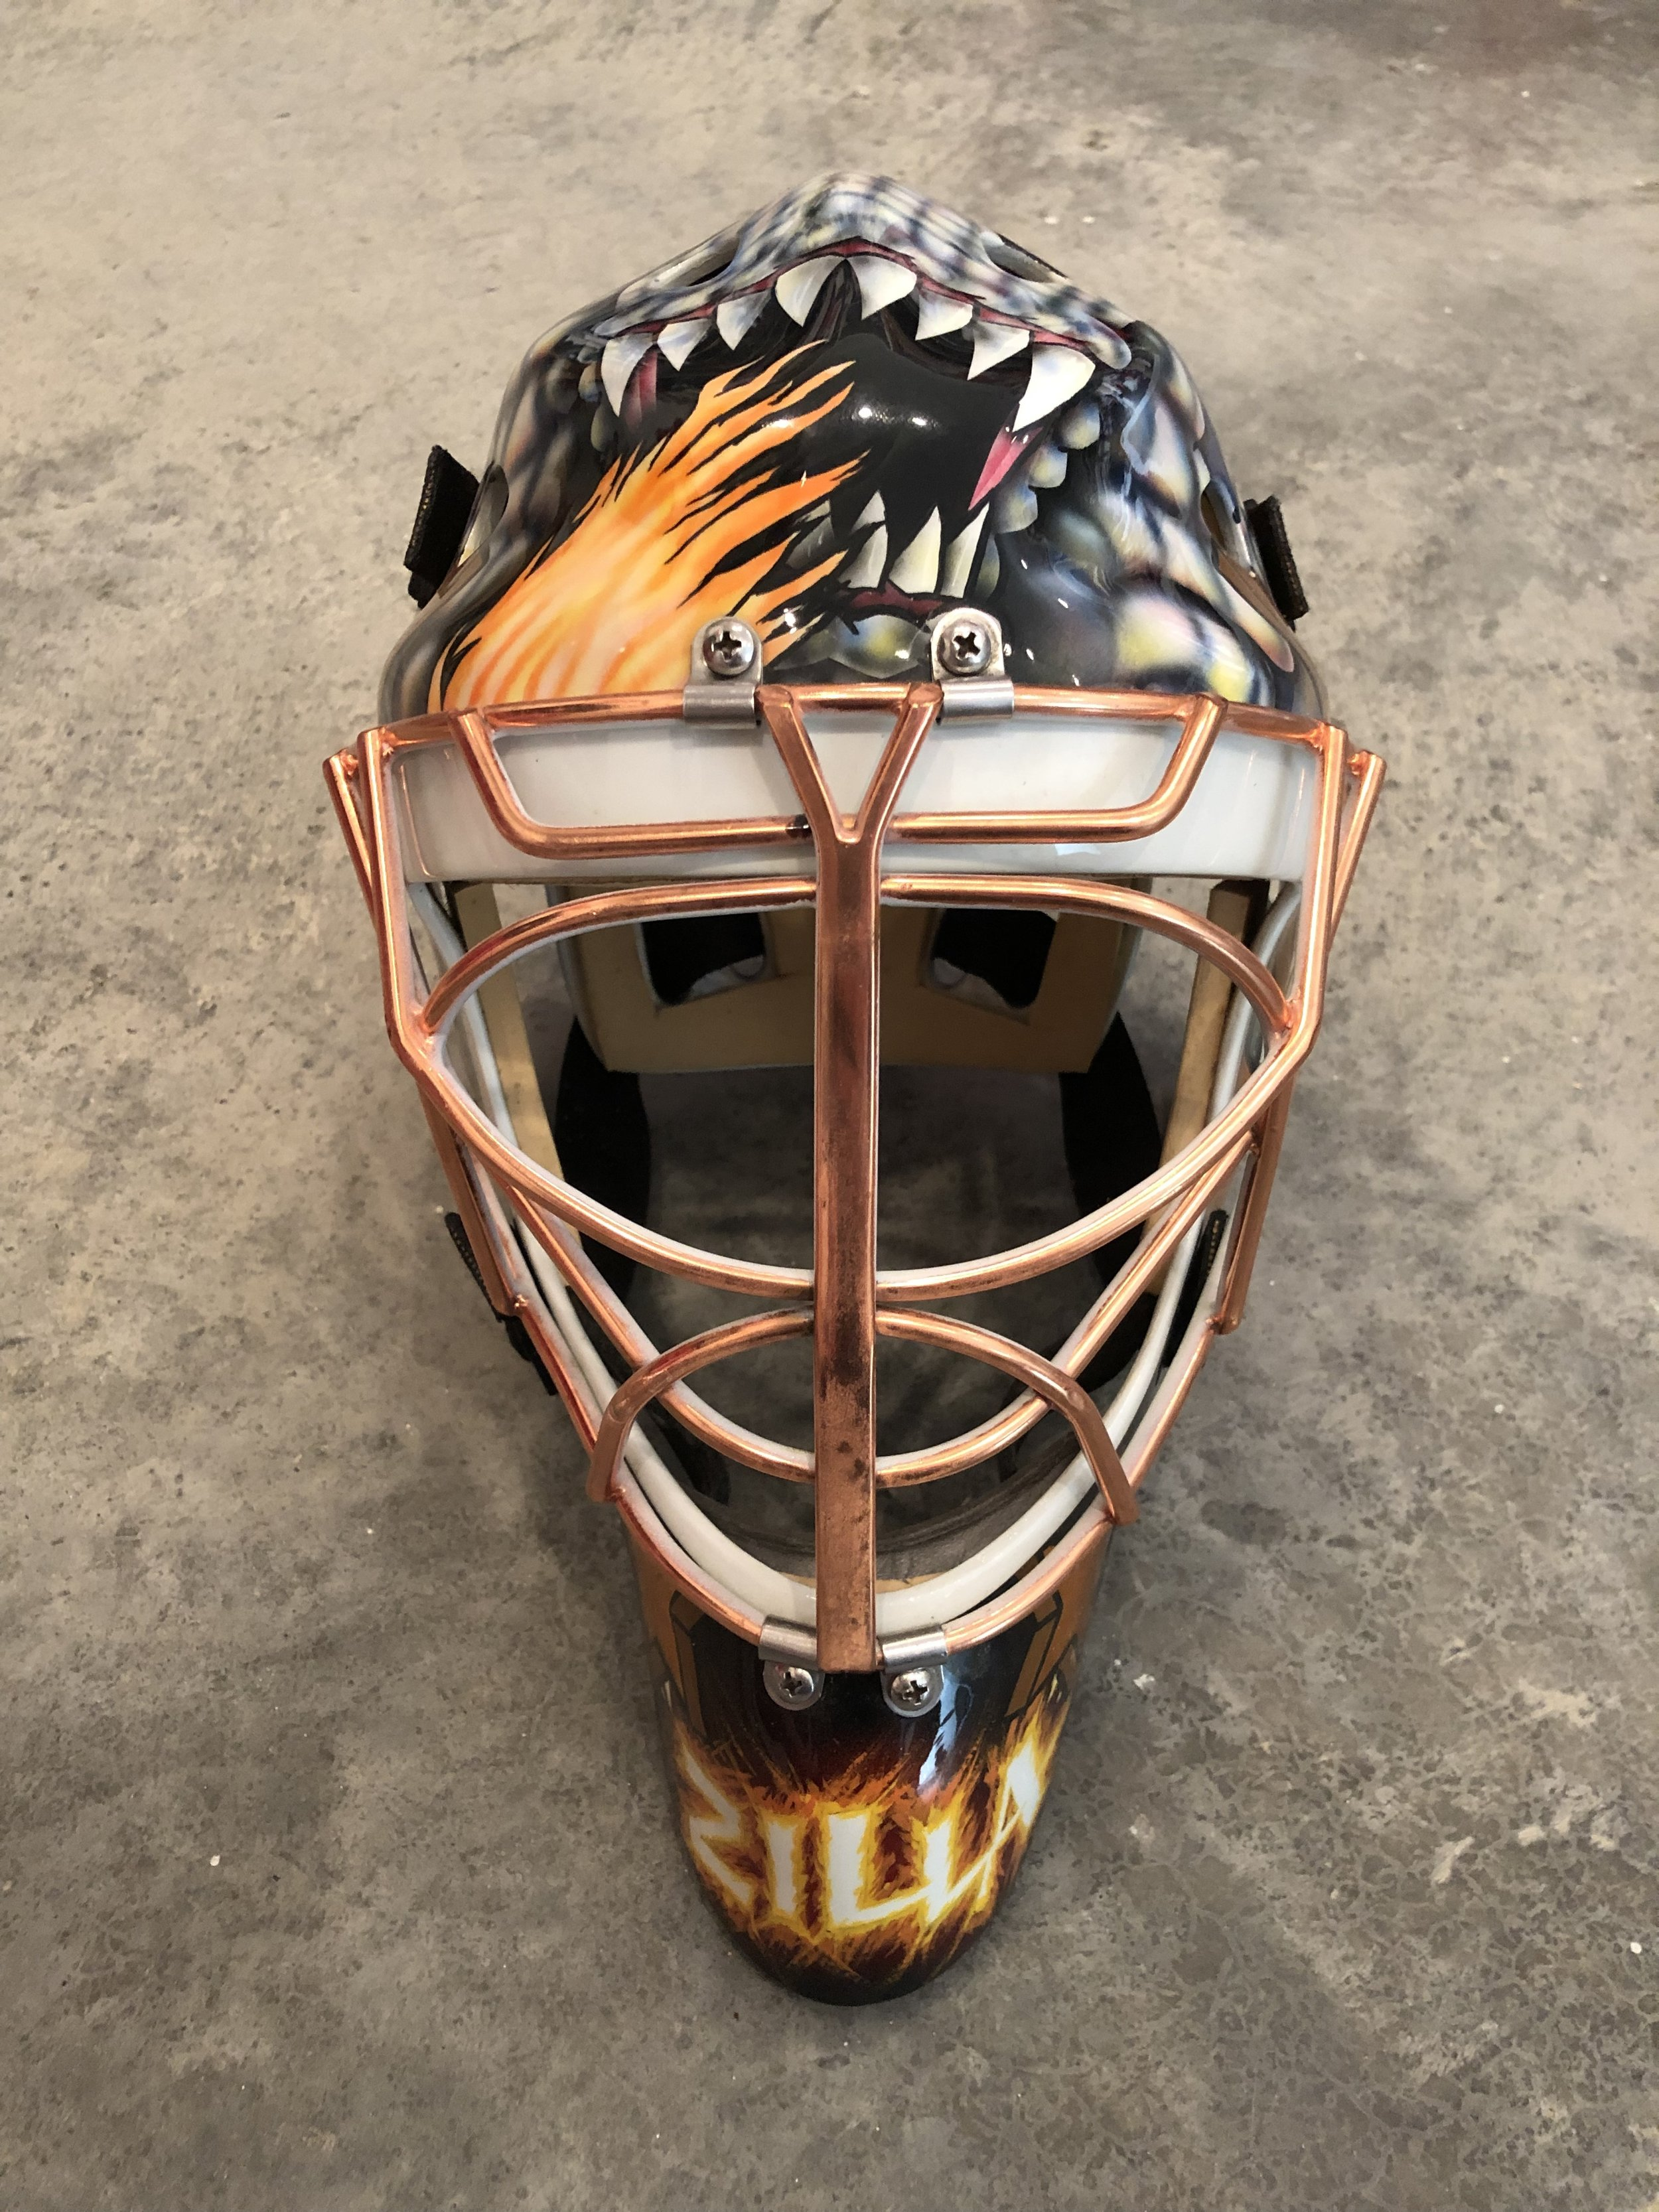 2002-03 Olaf Kolzig Washington Capitals game worn mask